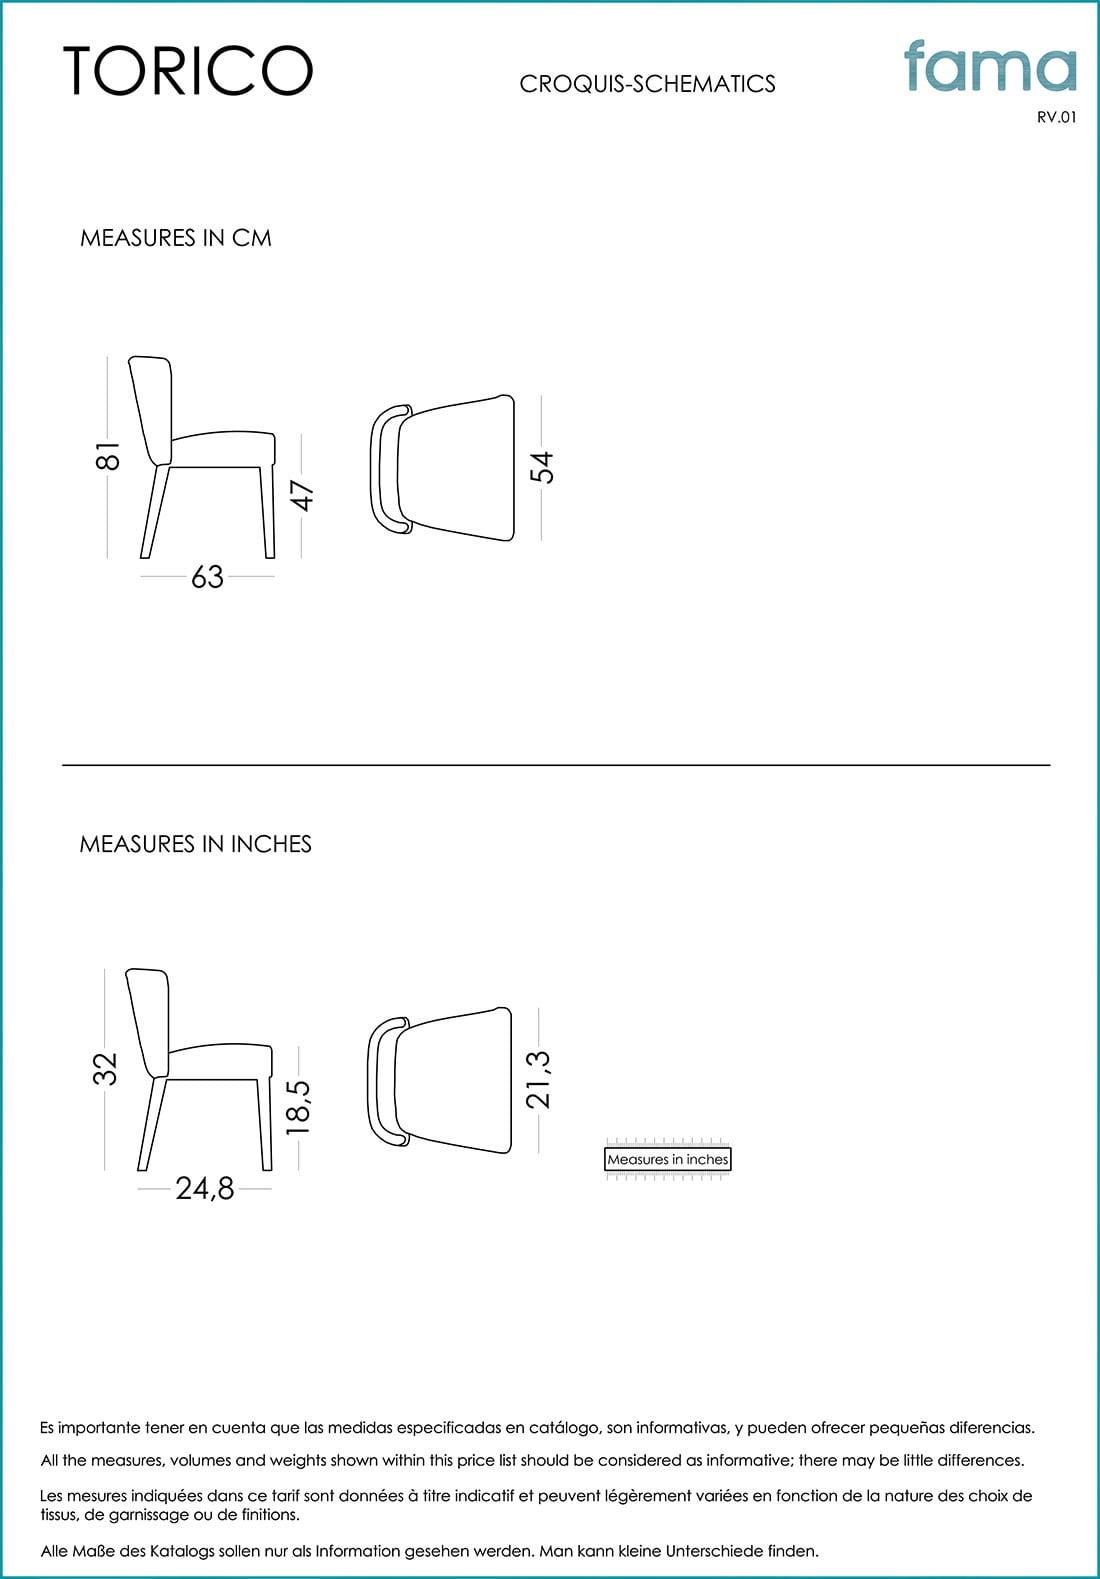 chaise_moderne_famaliving_montreal_torico_fiche_technique